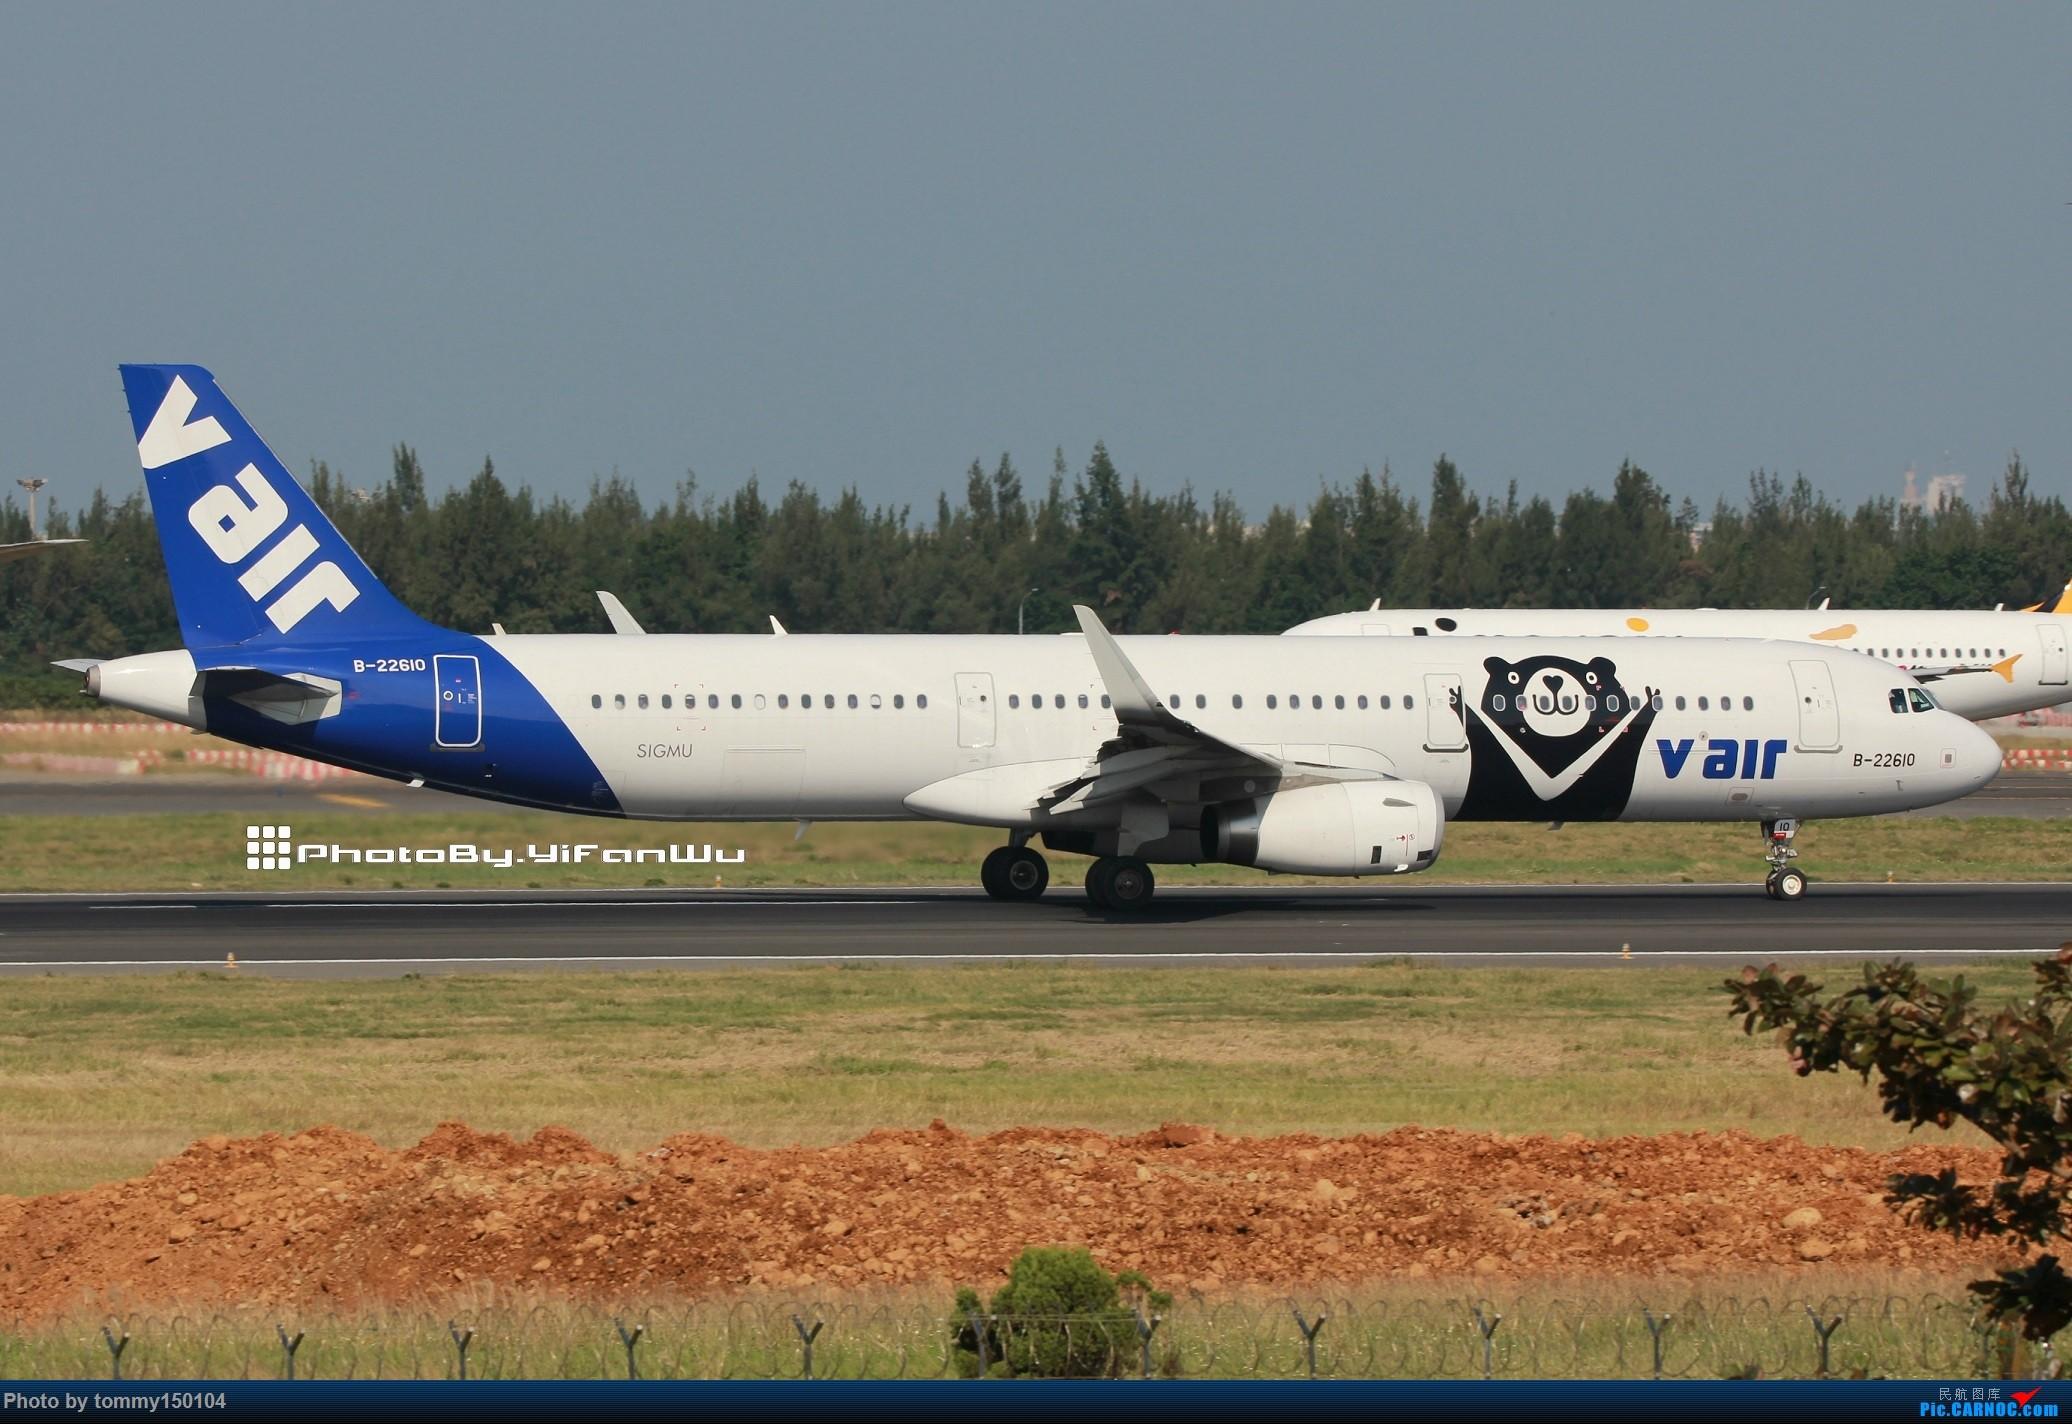 Re:[原创]新手試貼 TPE台北桃園 AIRBUS A321-200 B-22610 中国台北桃园国际机场